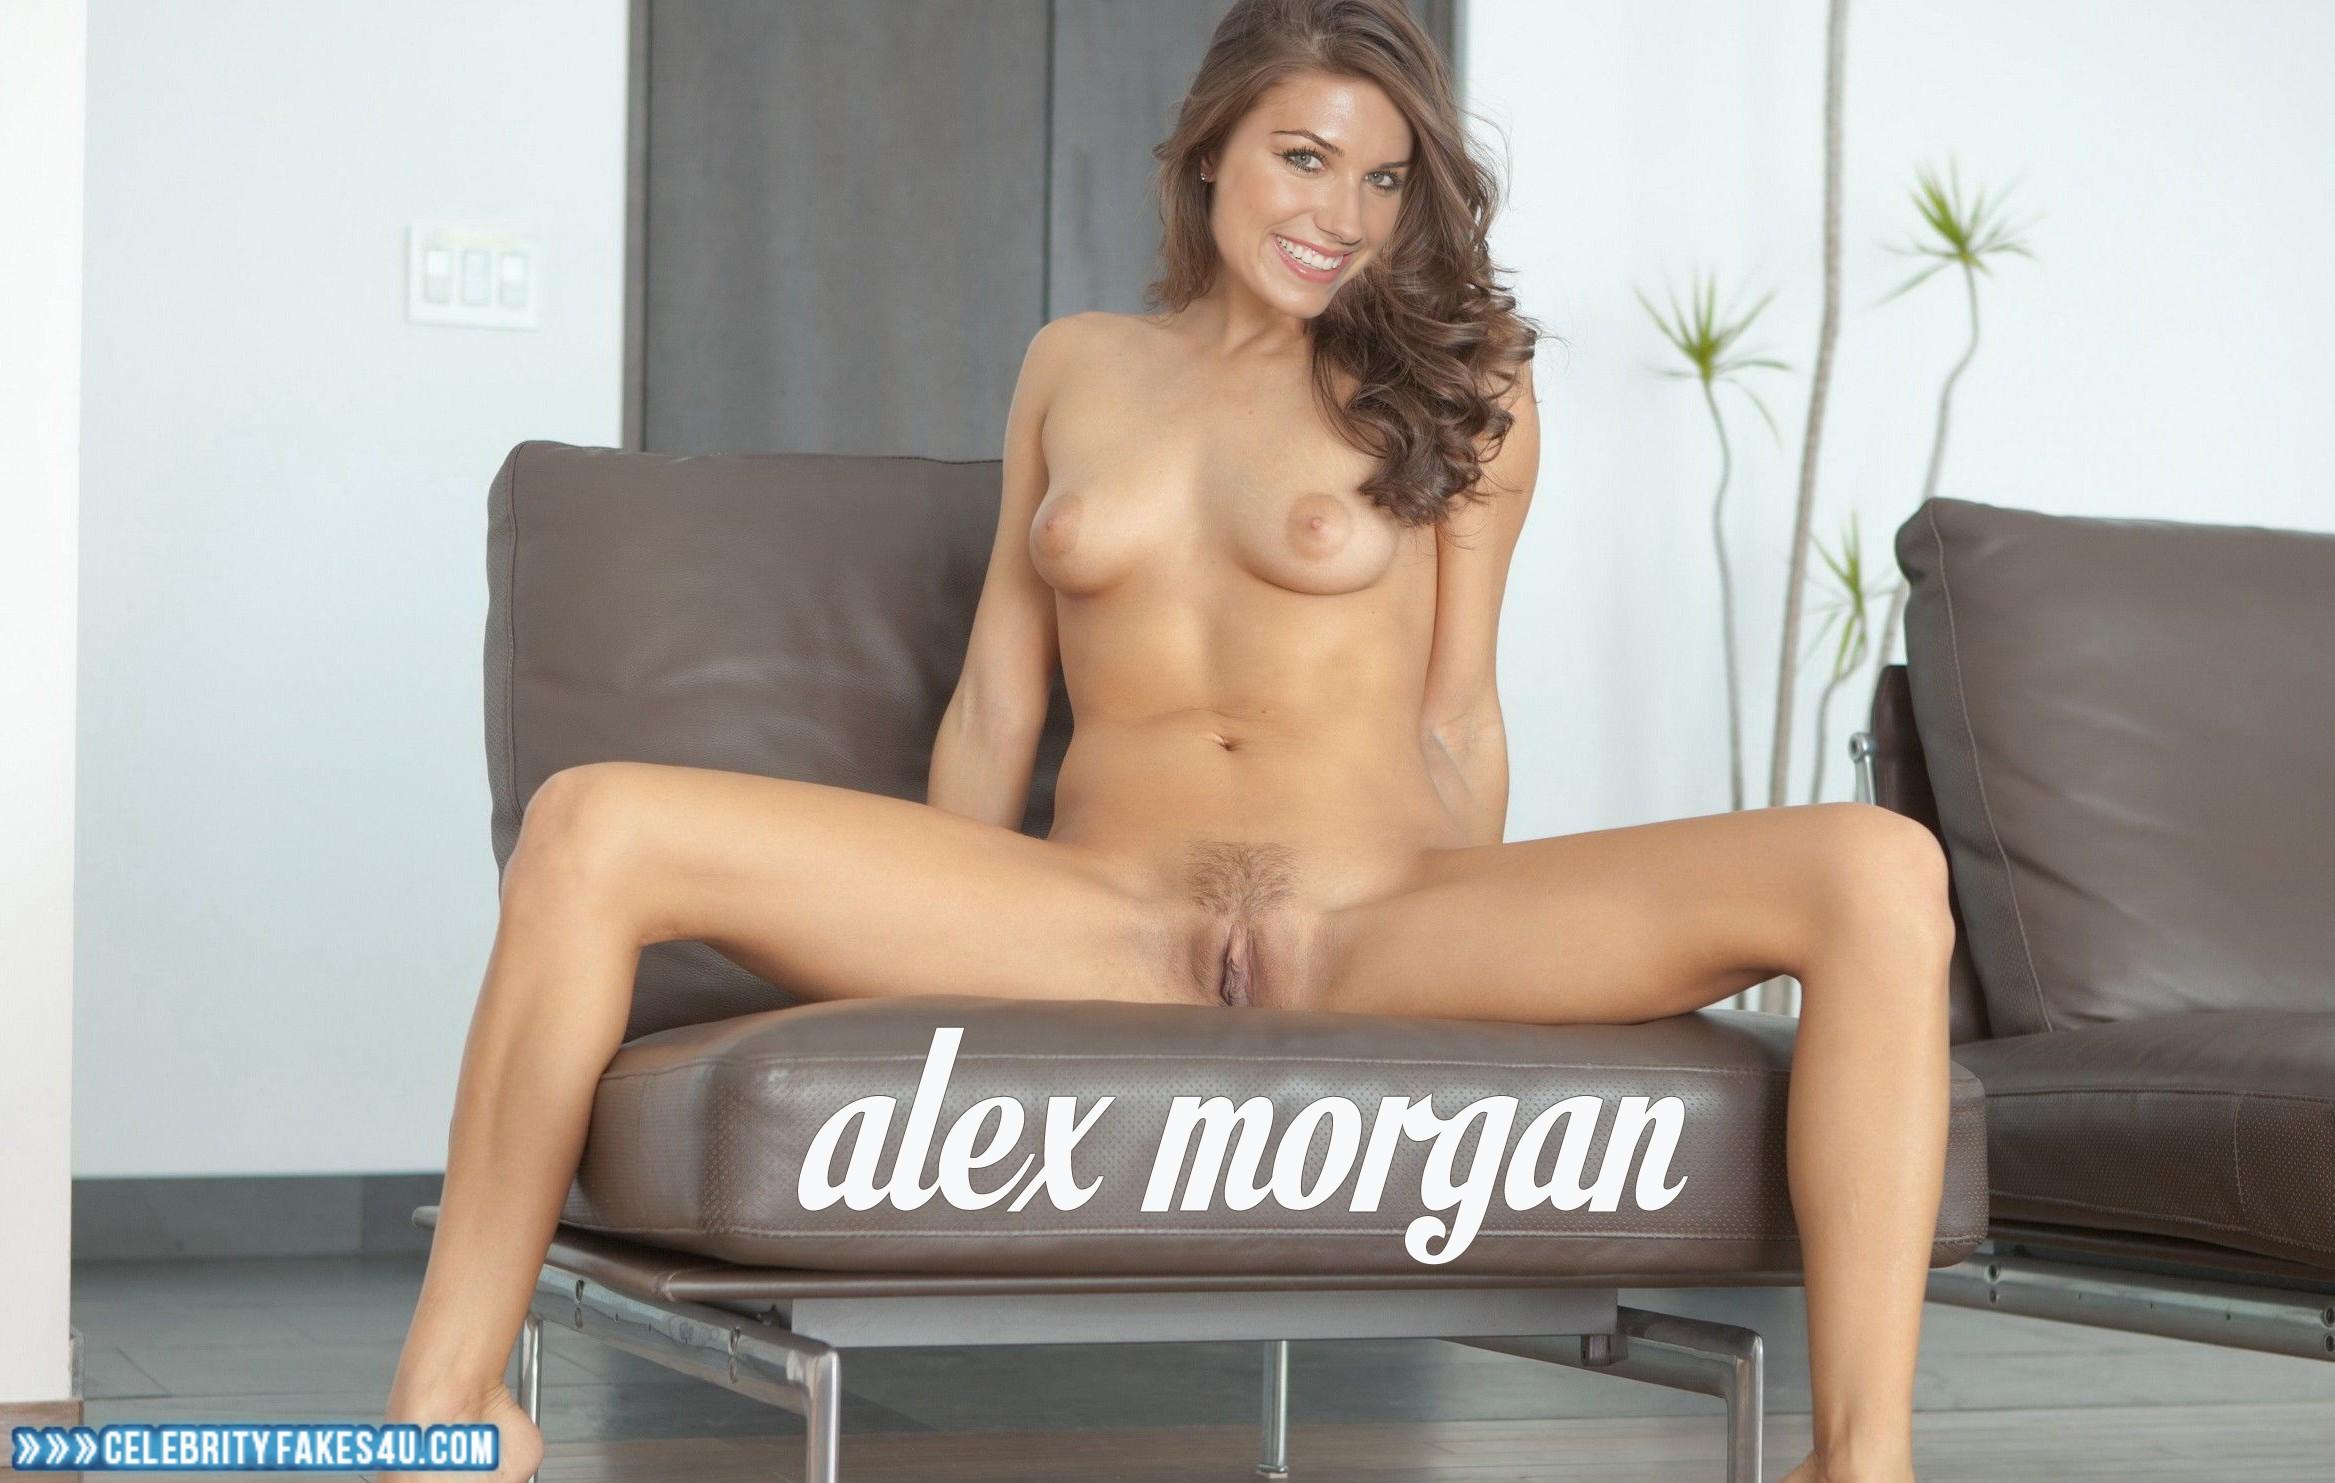 Alex morgan fake porn